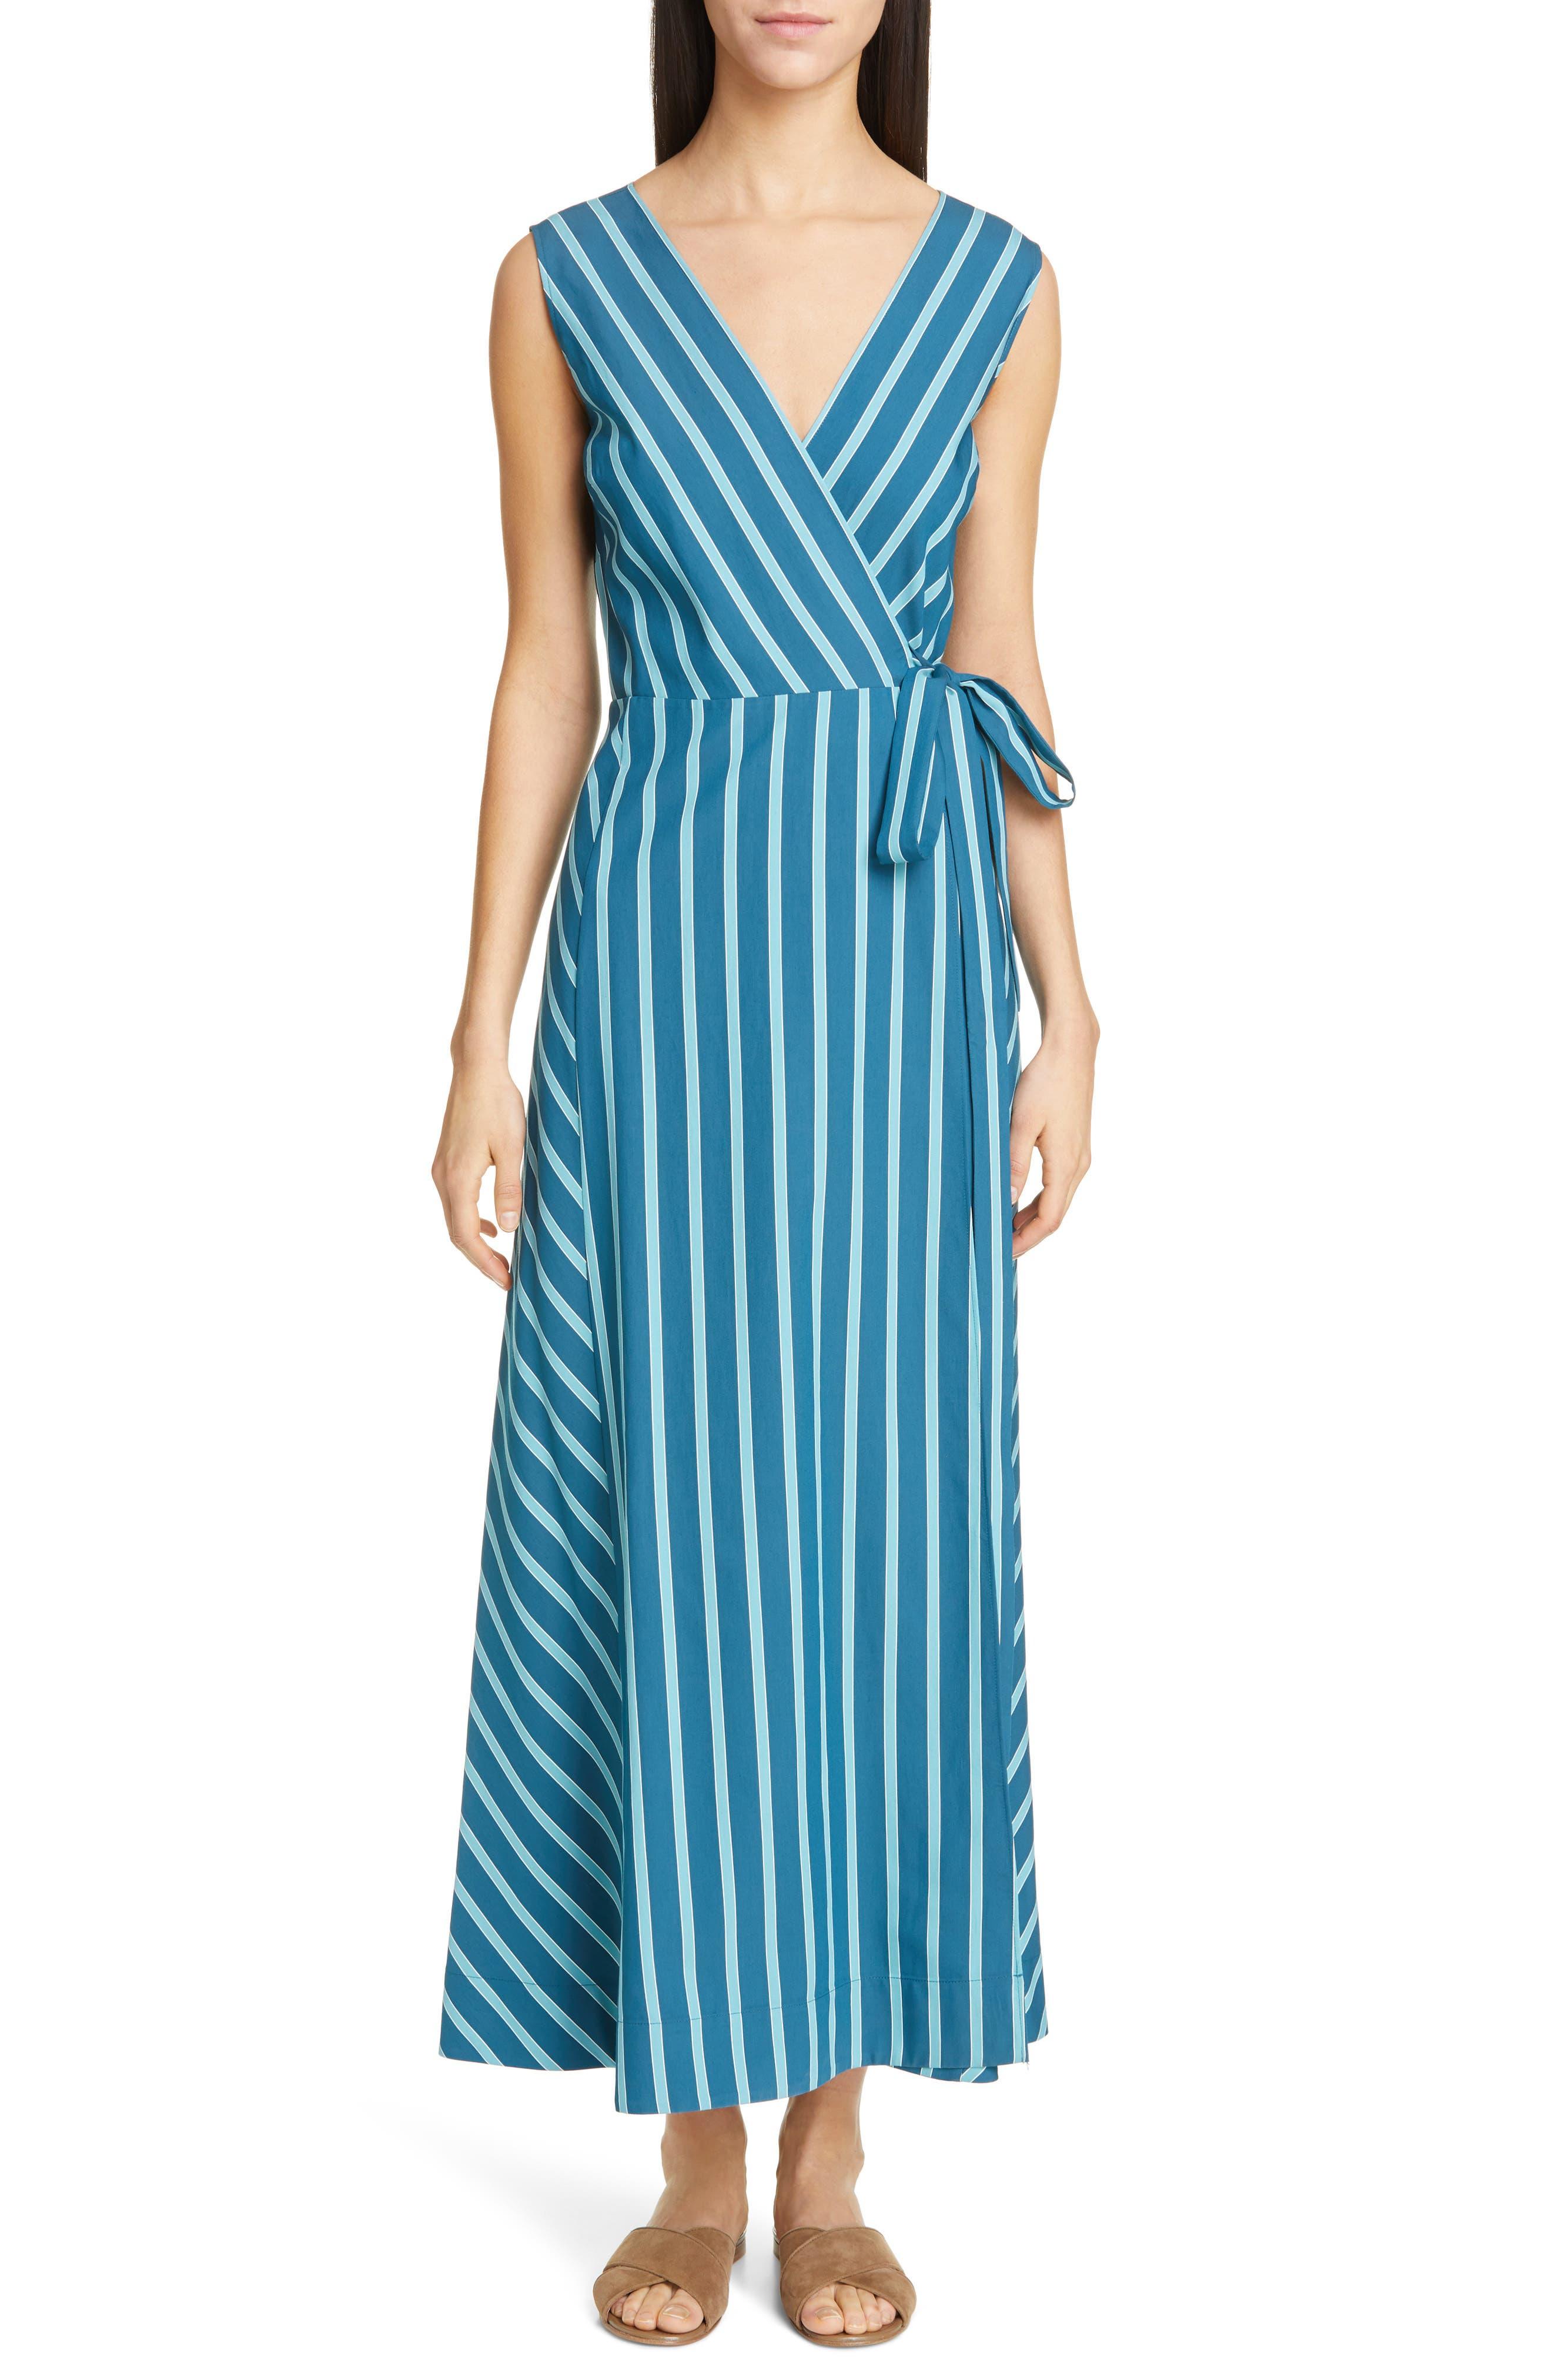 LAFAYETTE 148 NEW YORK, Siri Wrap Dress, Main thumbnail 1, color, PACIFIC MULTI